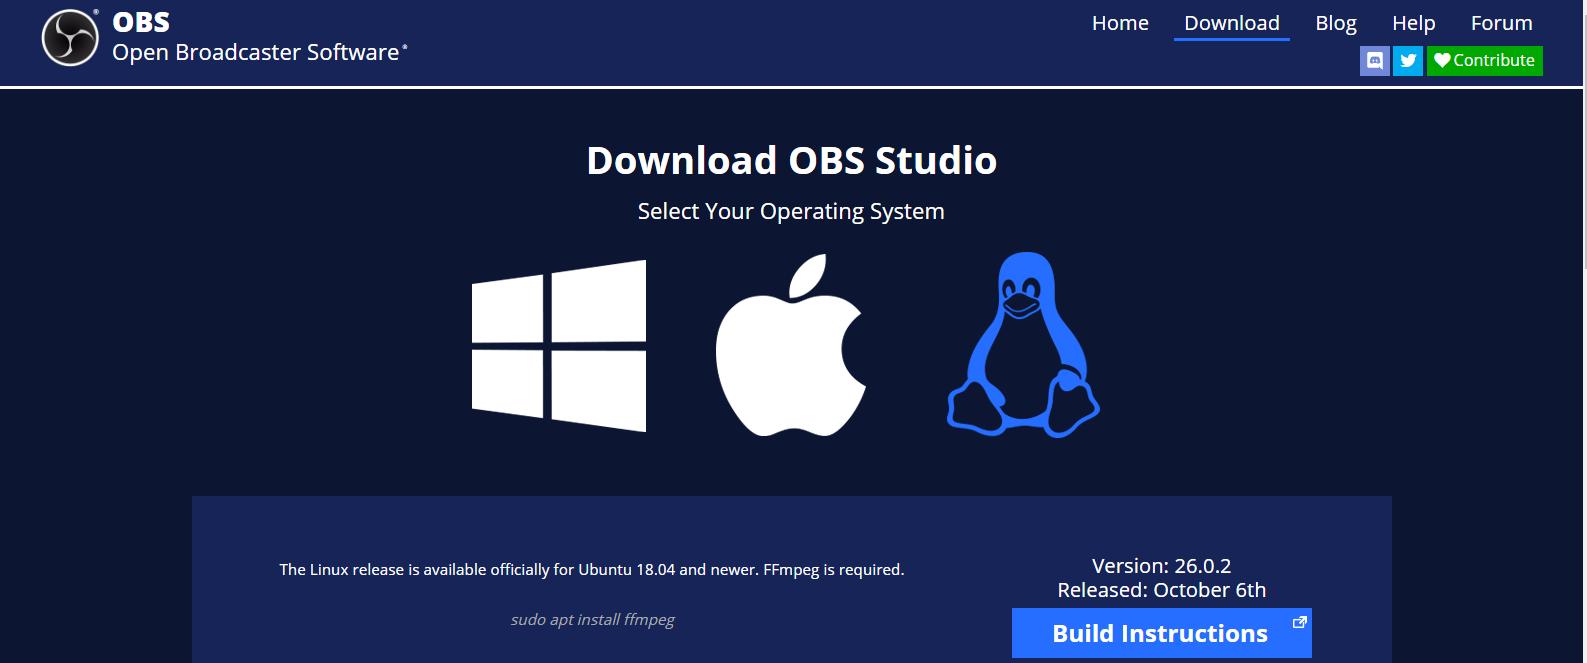 Install OBS Studio on Windows, macOS, Ubuntu